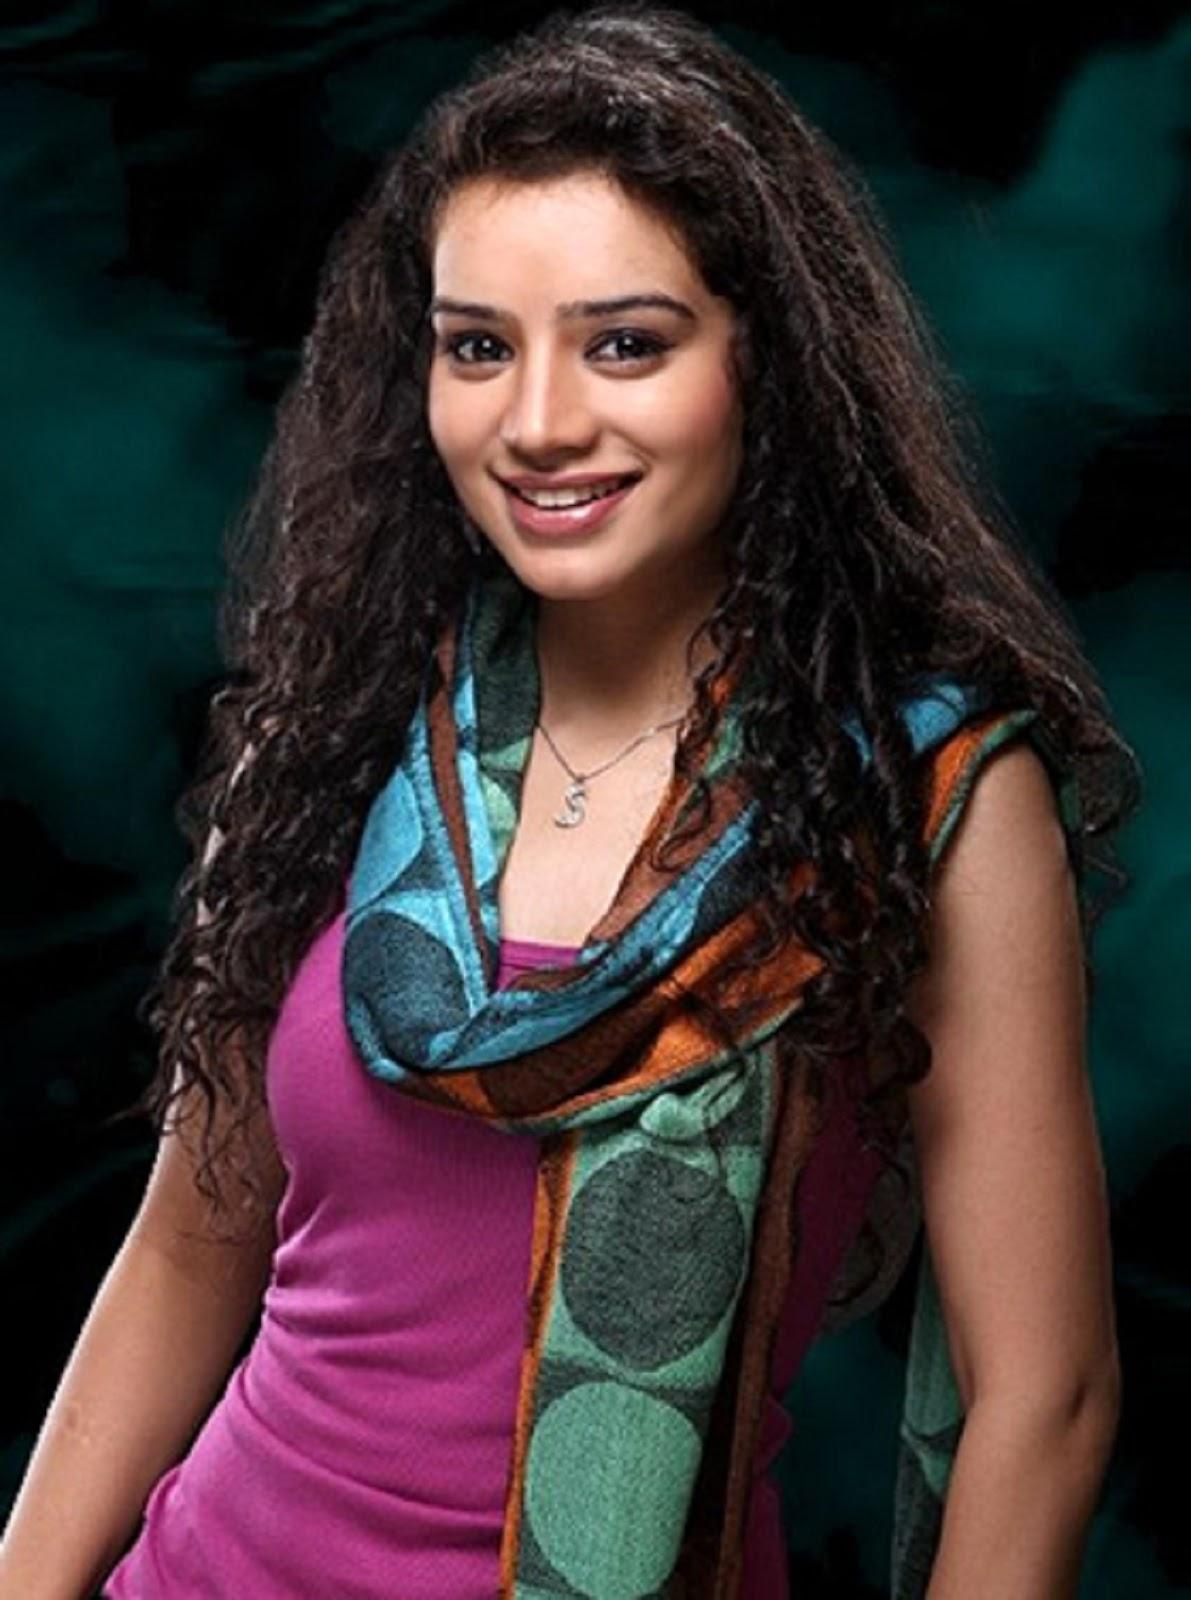 Krystle Dsouza Hd Wallpaper Beautiful Sukirti Kandpal Hd Wallpaper All 4u Stars